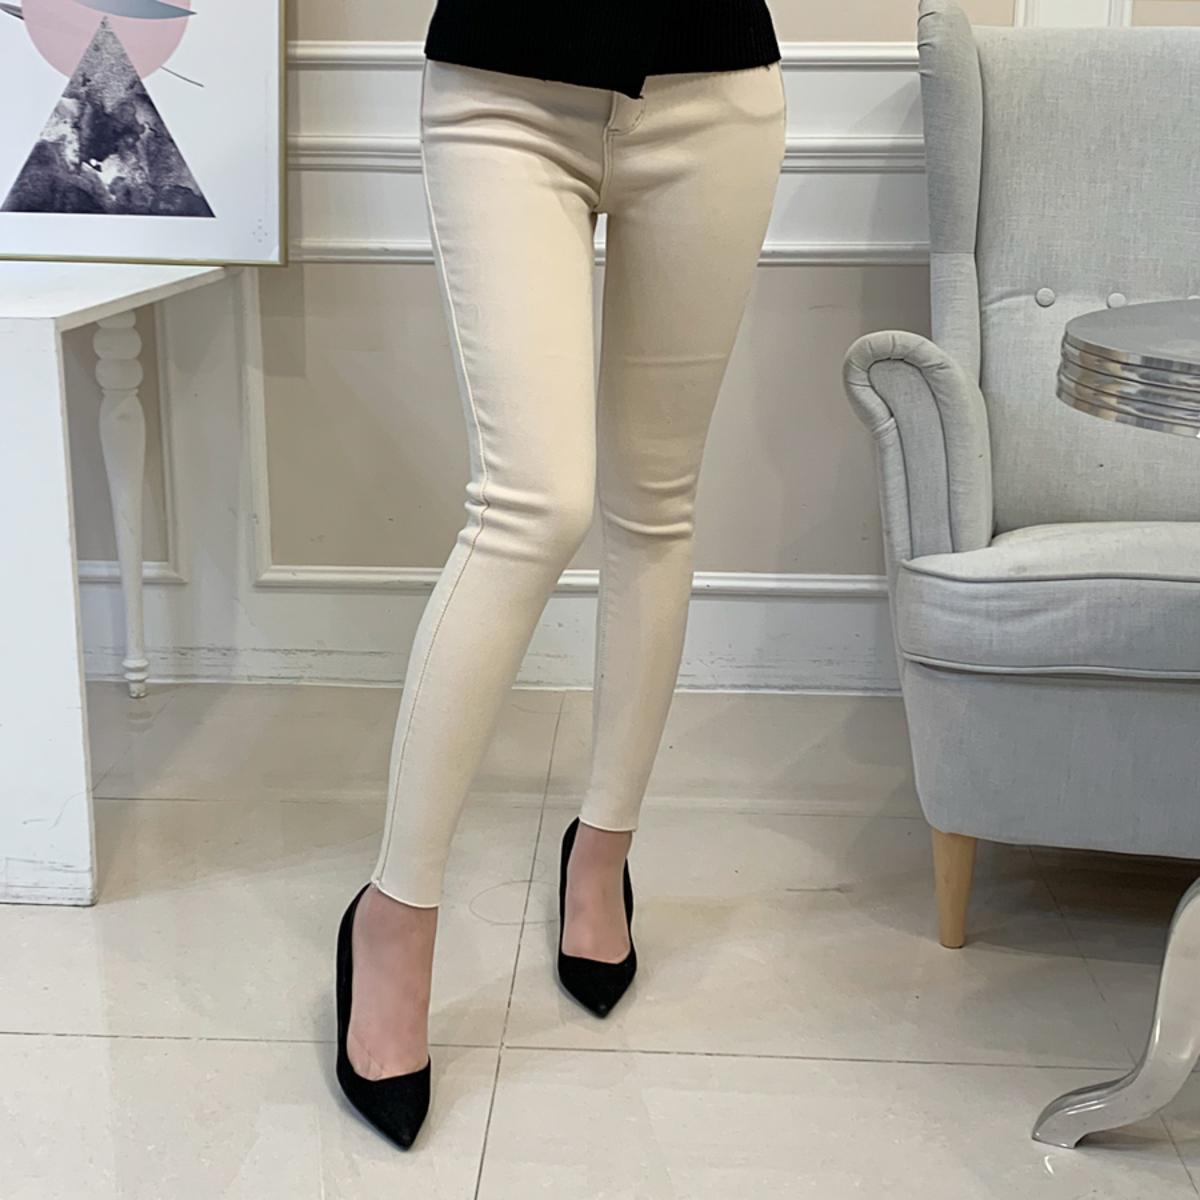 Tahitian Gypsy Span Skinny Jeans